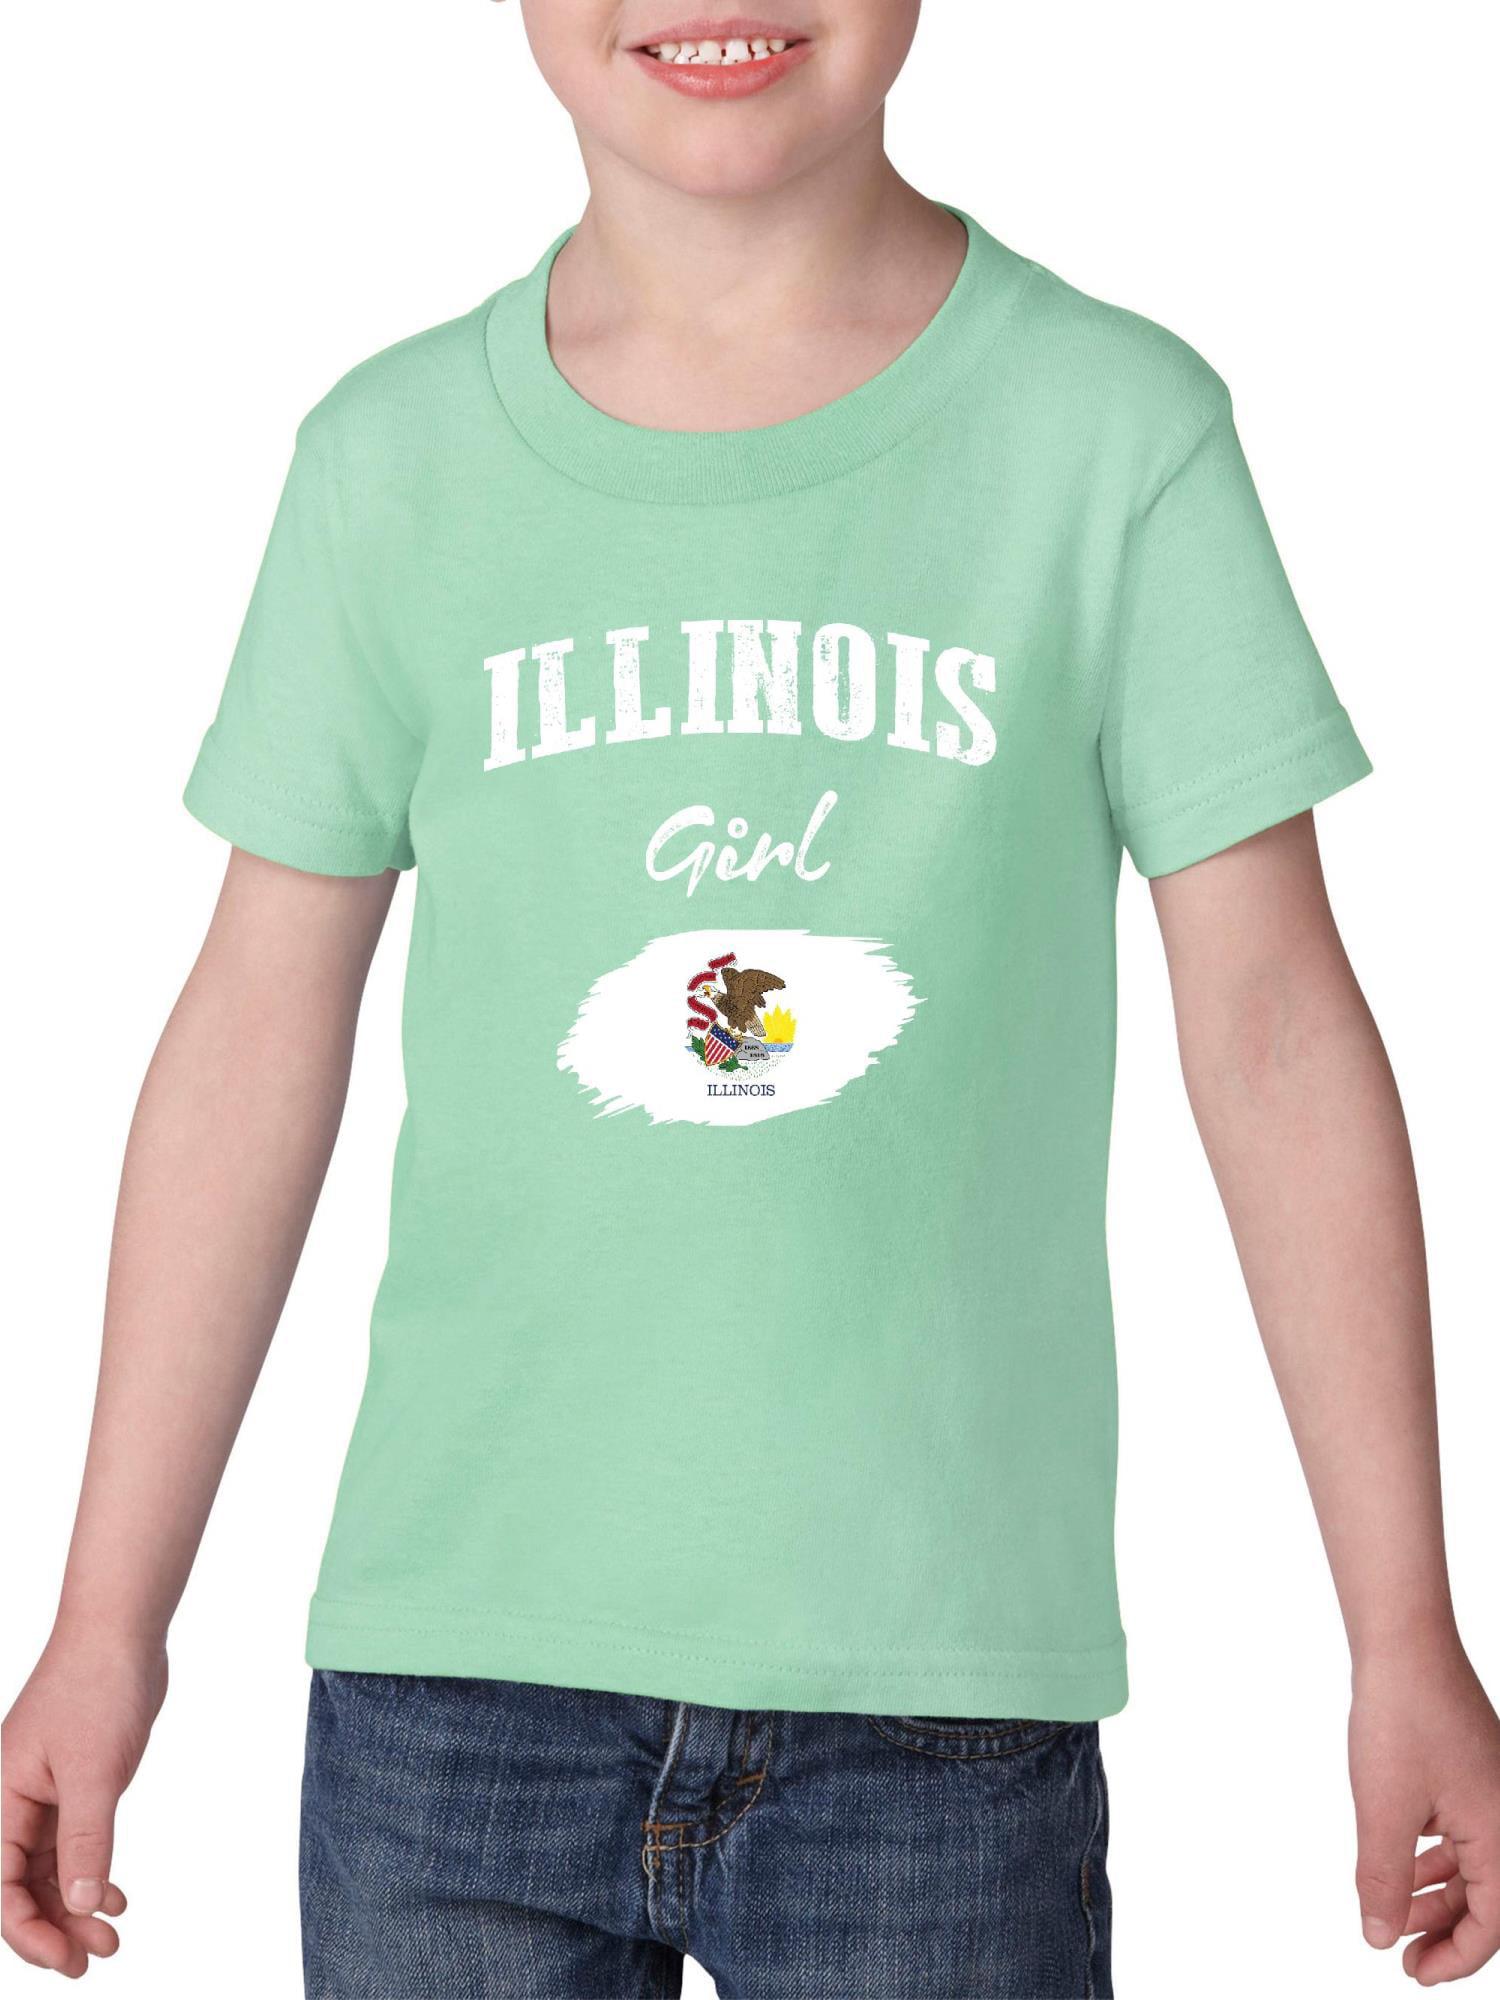 Illinois Girl Heavy Cotton Toddler Kids T-Shirt Tee Clothing